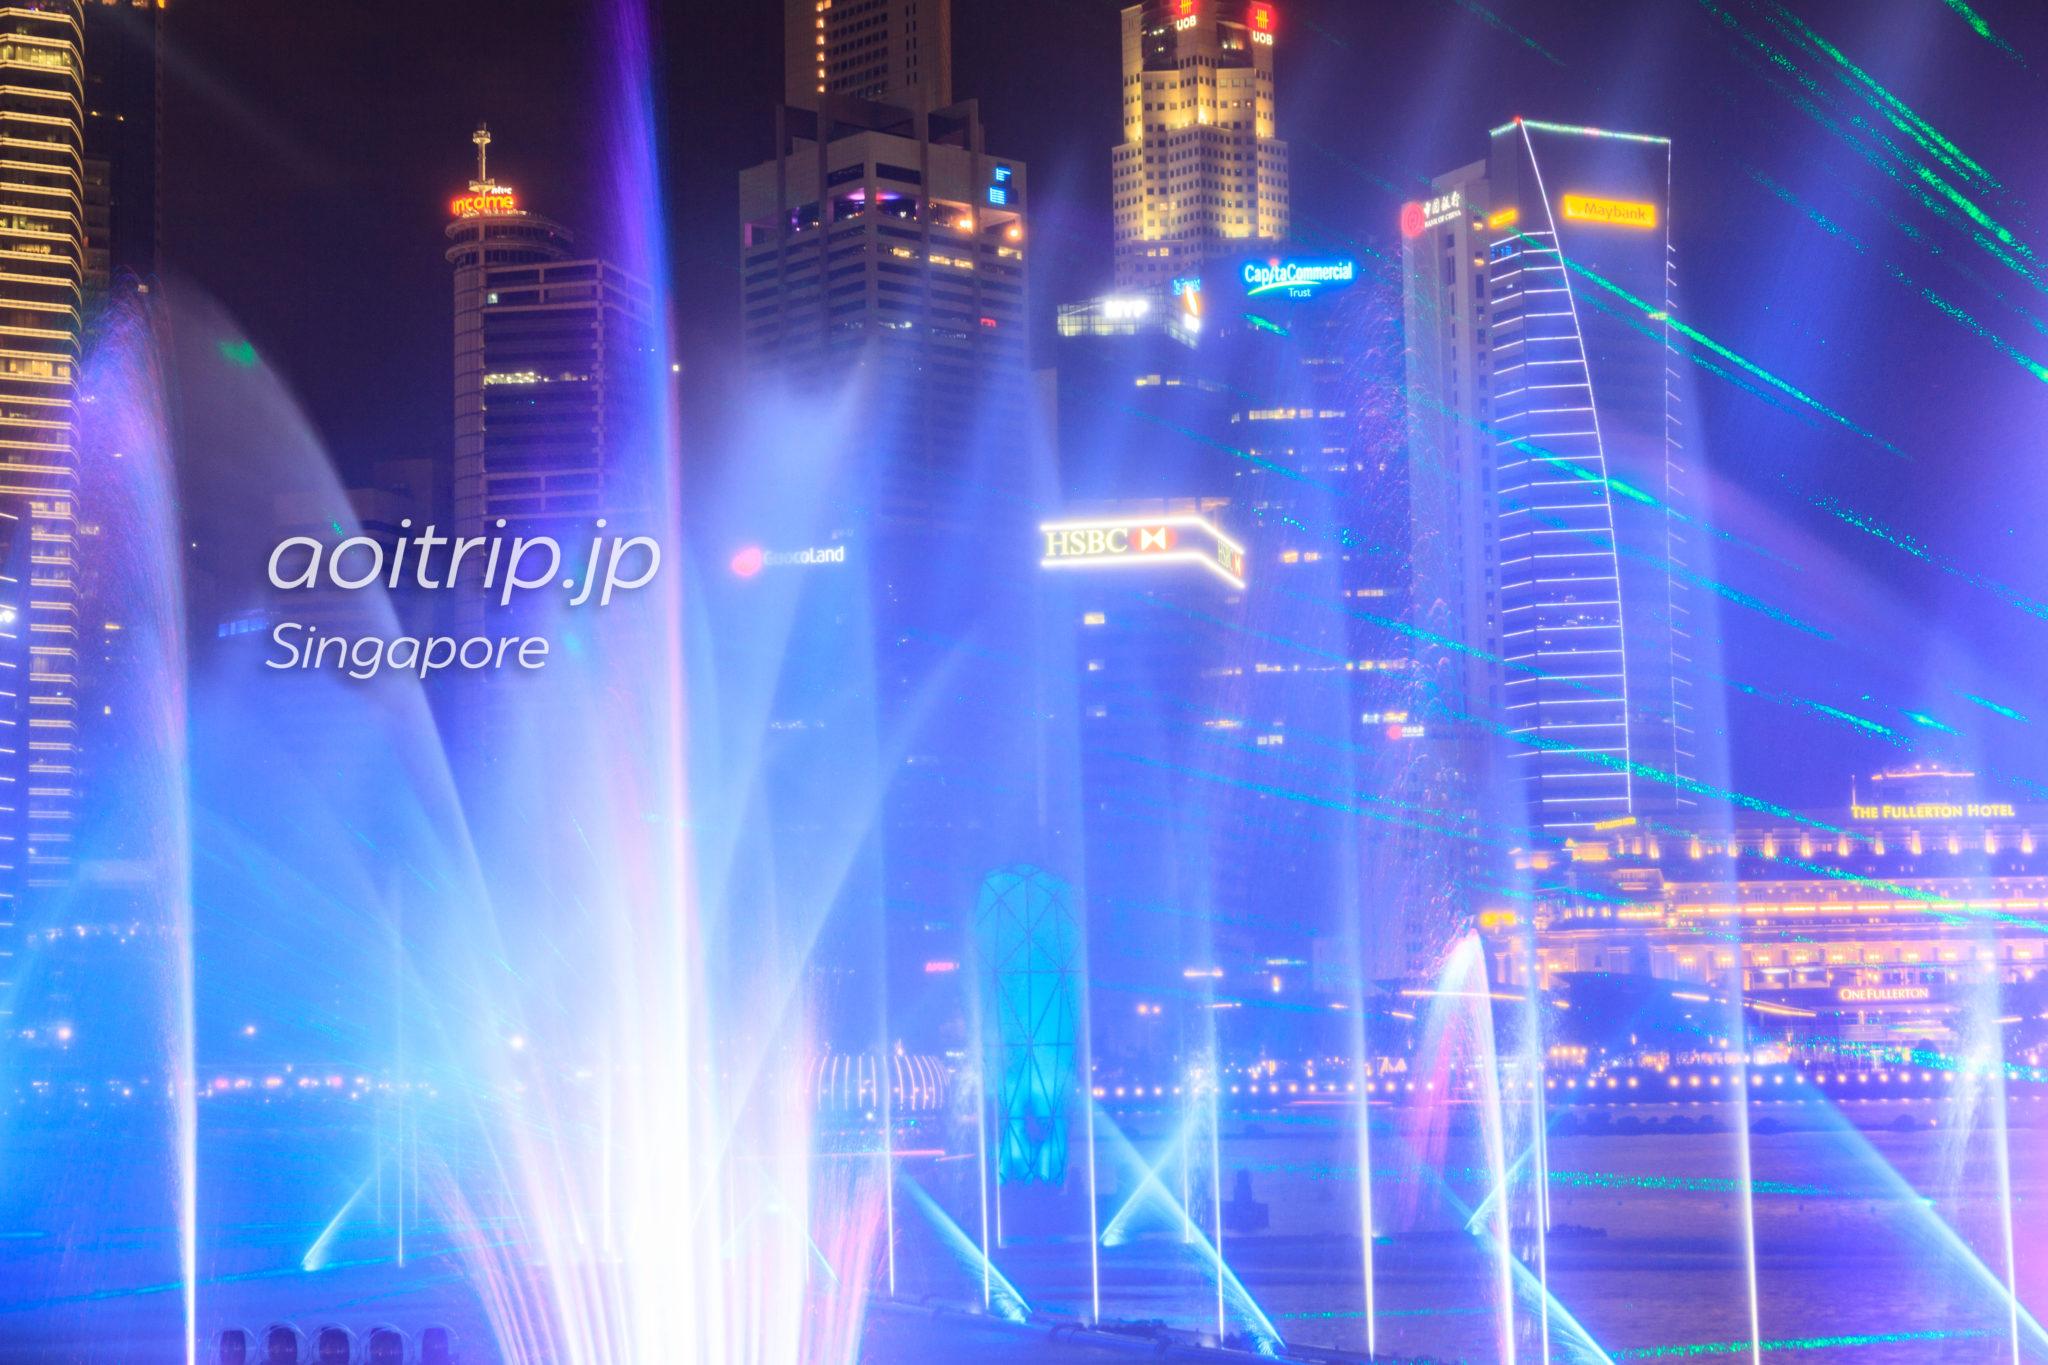 SPECTRA(スペクトラ) マリーナベイの「光と水のシンフォニー噴水ショー」